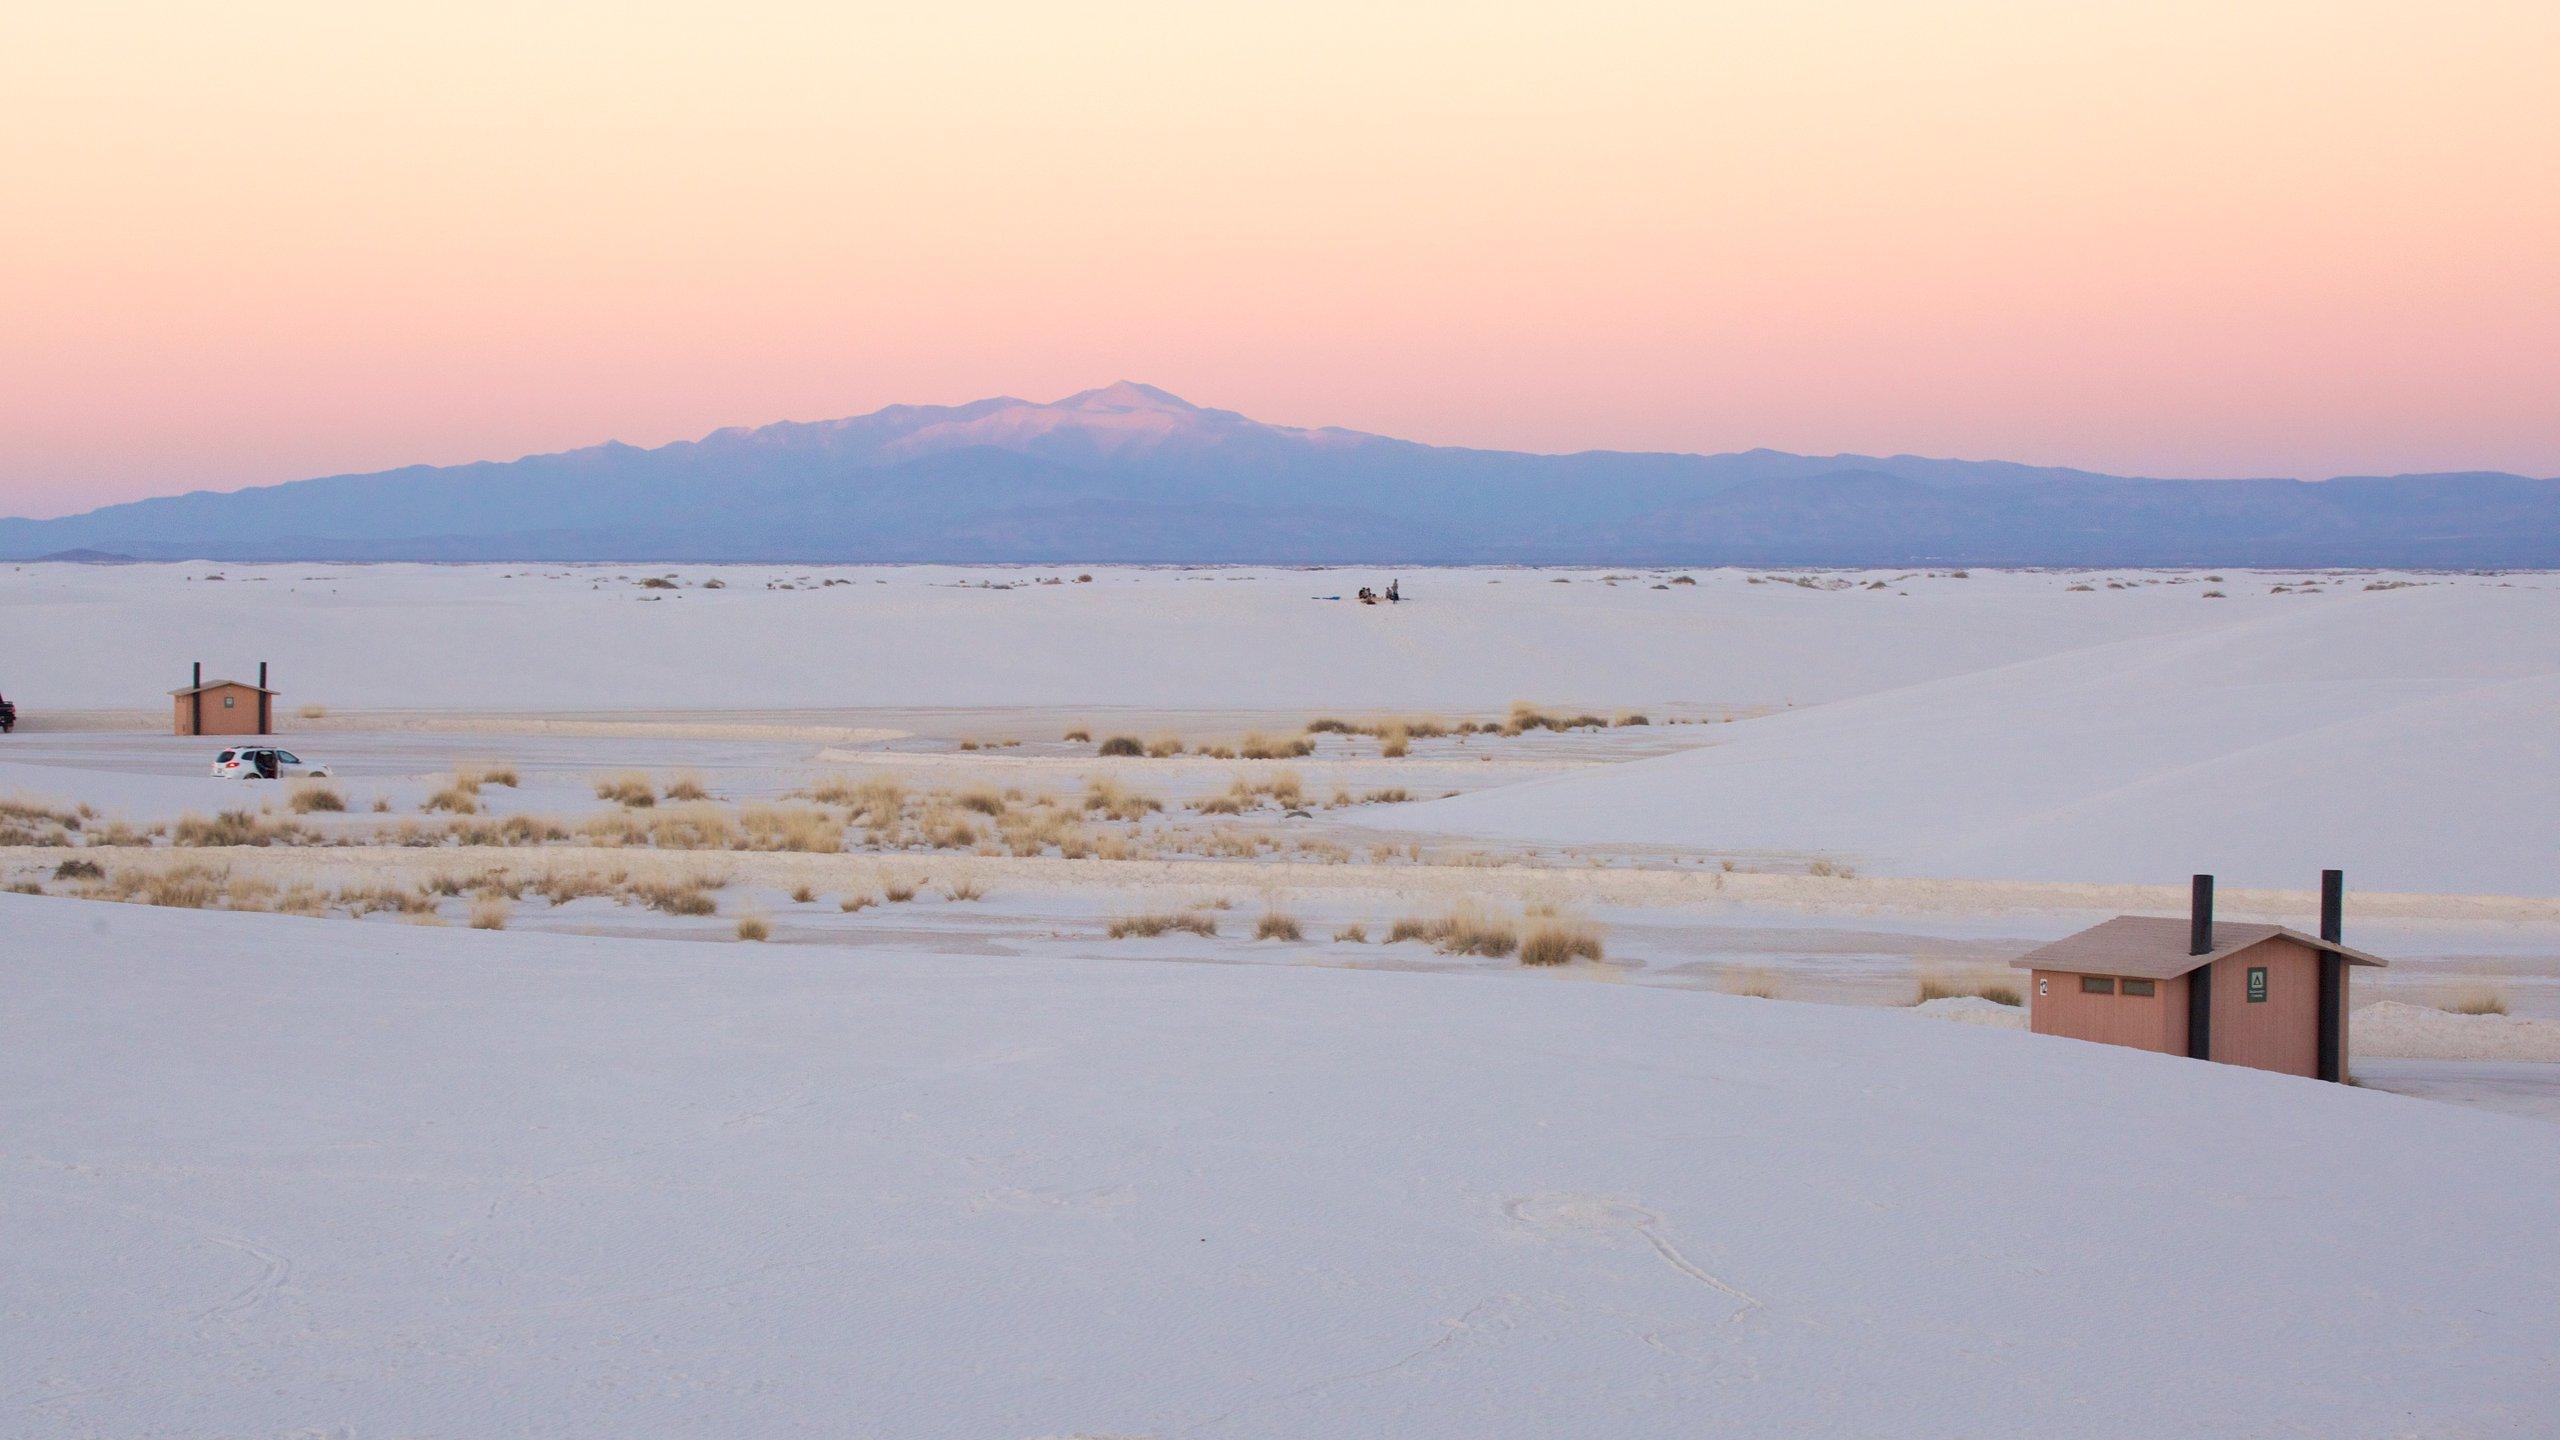 Alamogordo, New Mexico, Verenigde Staten